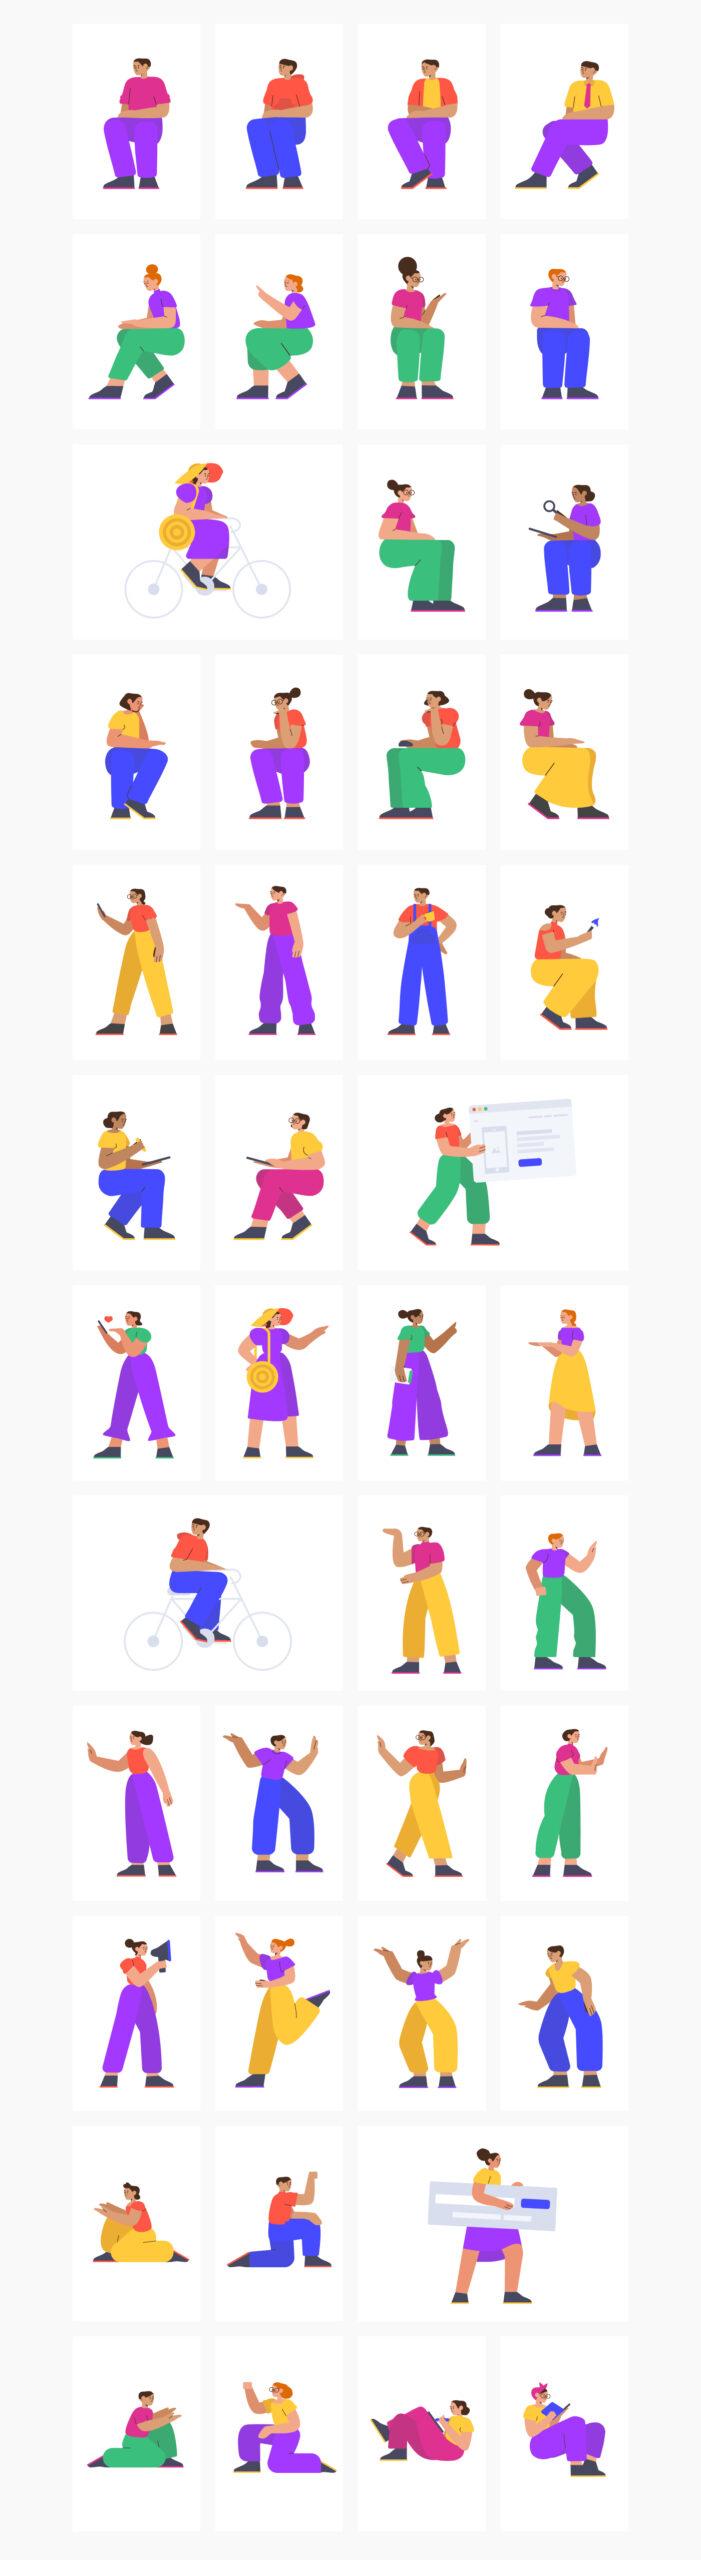 Smash人物插画素材包插图